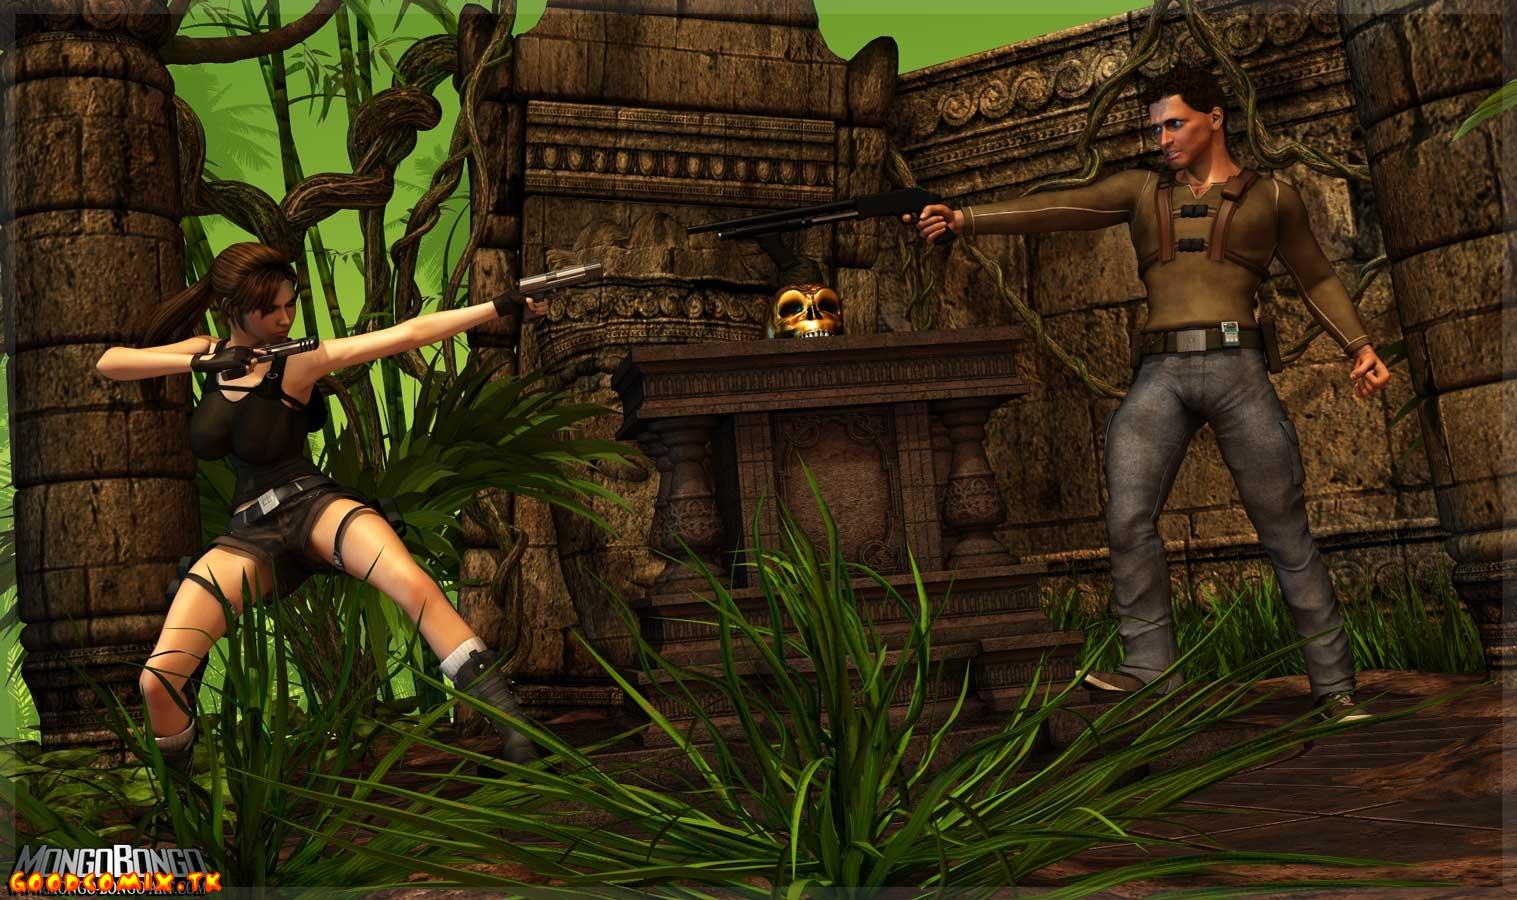 Goodcomix.tk Tomb Raider - [Mongo Bongo] - Lara Croft & Nathan Drake